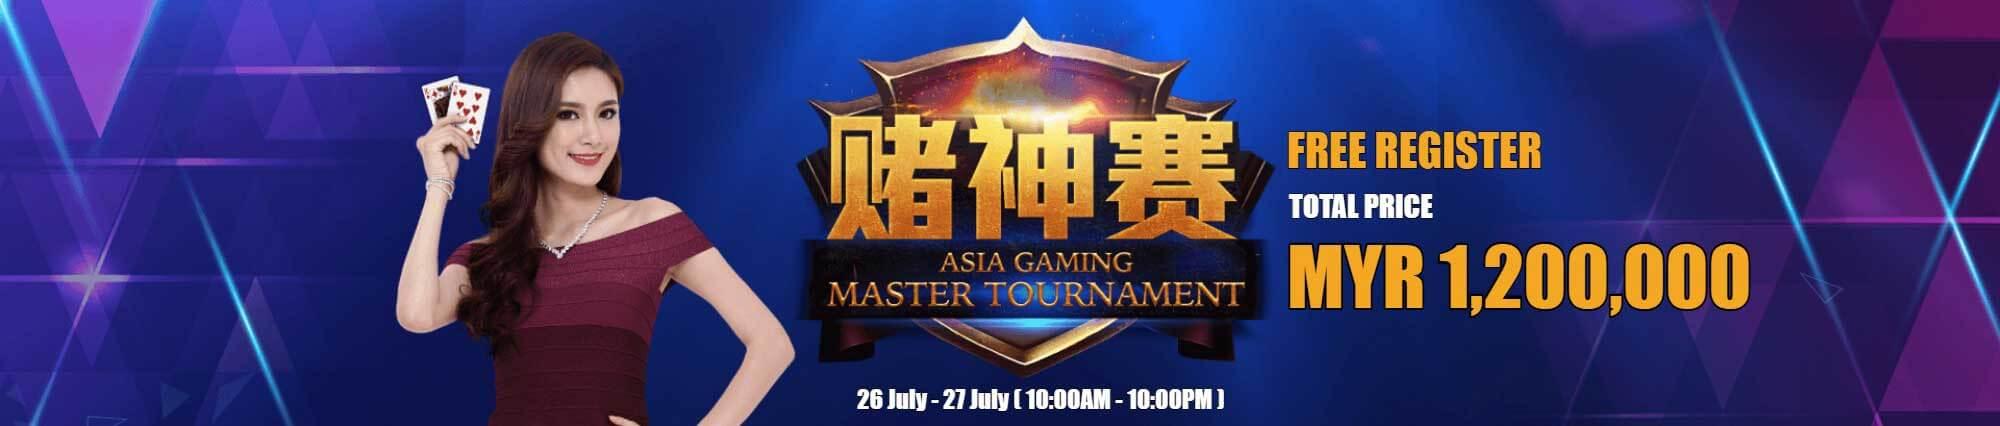 AG master tournament